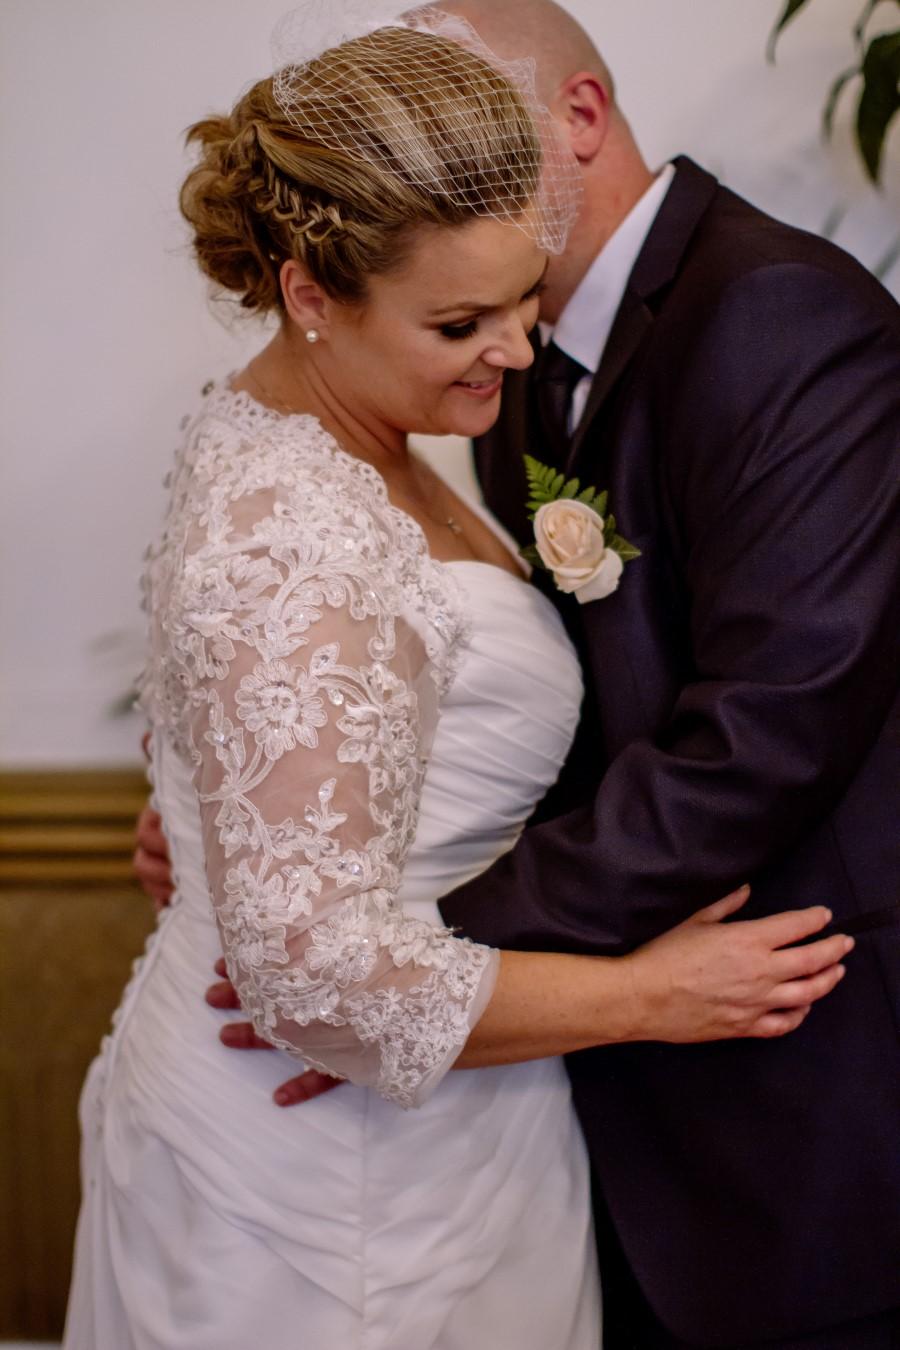 nz_wedding_st_leonards_mchughs-713